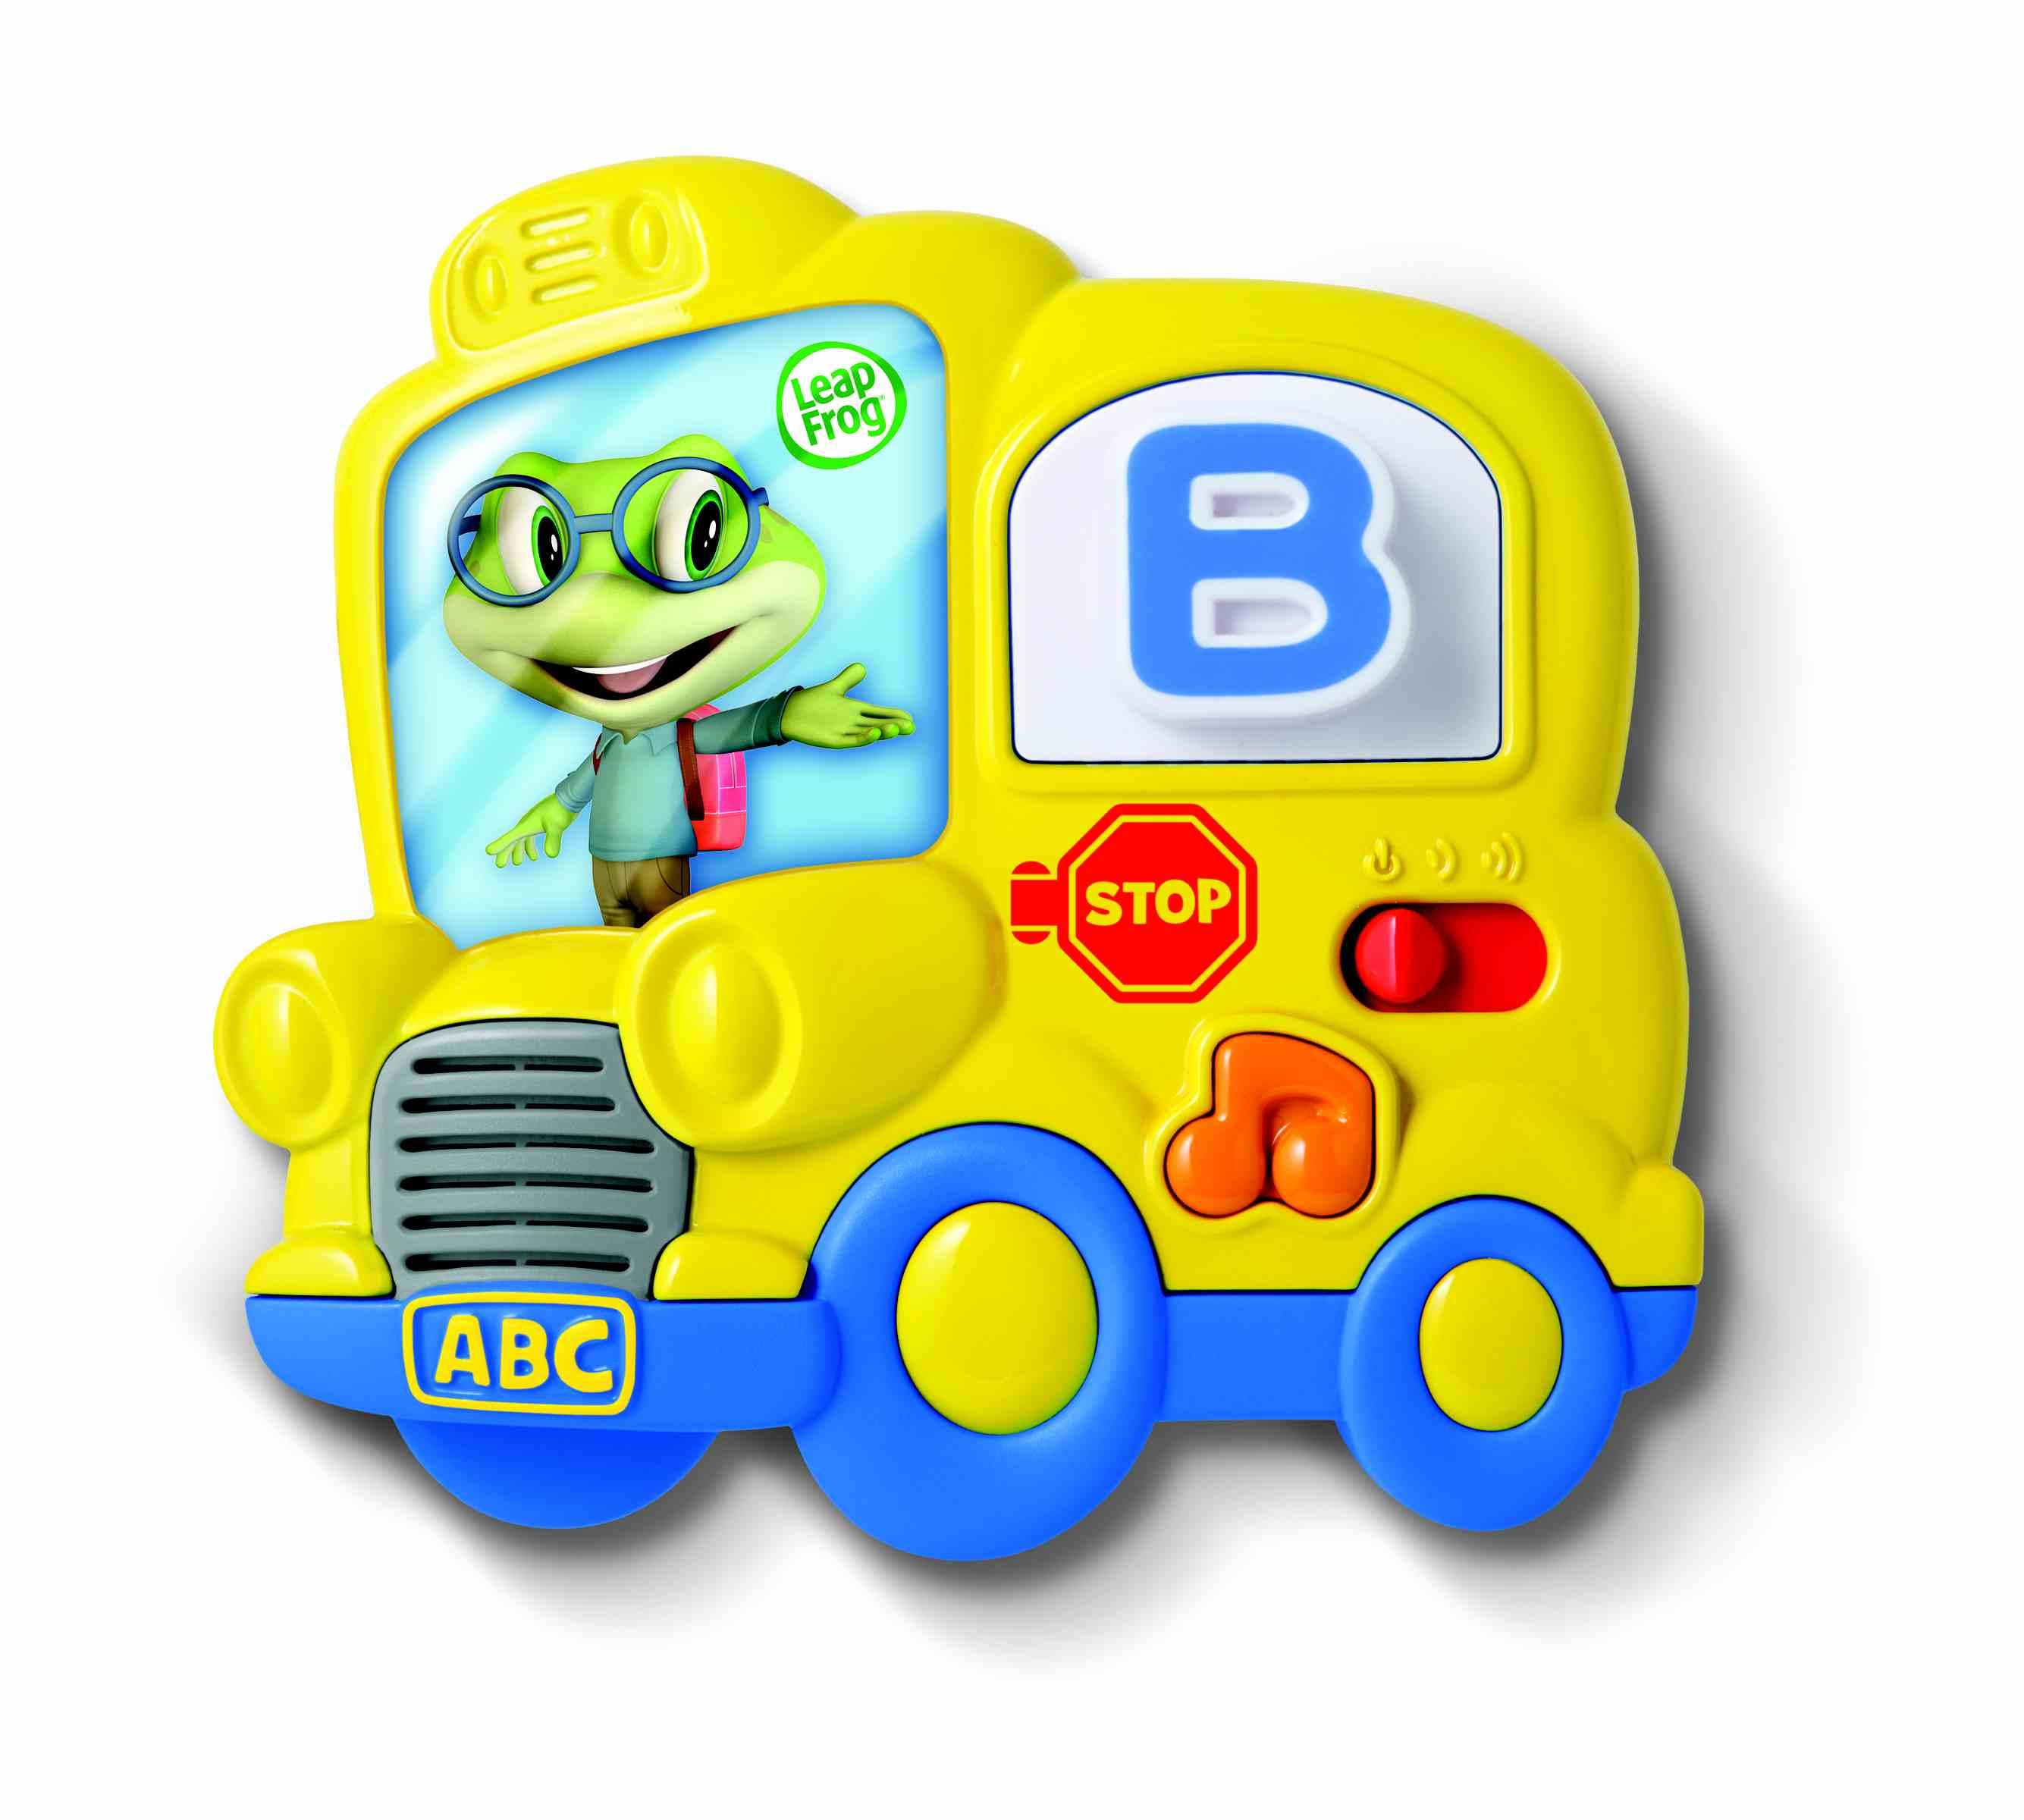 Phonics Toys For Preschoolers